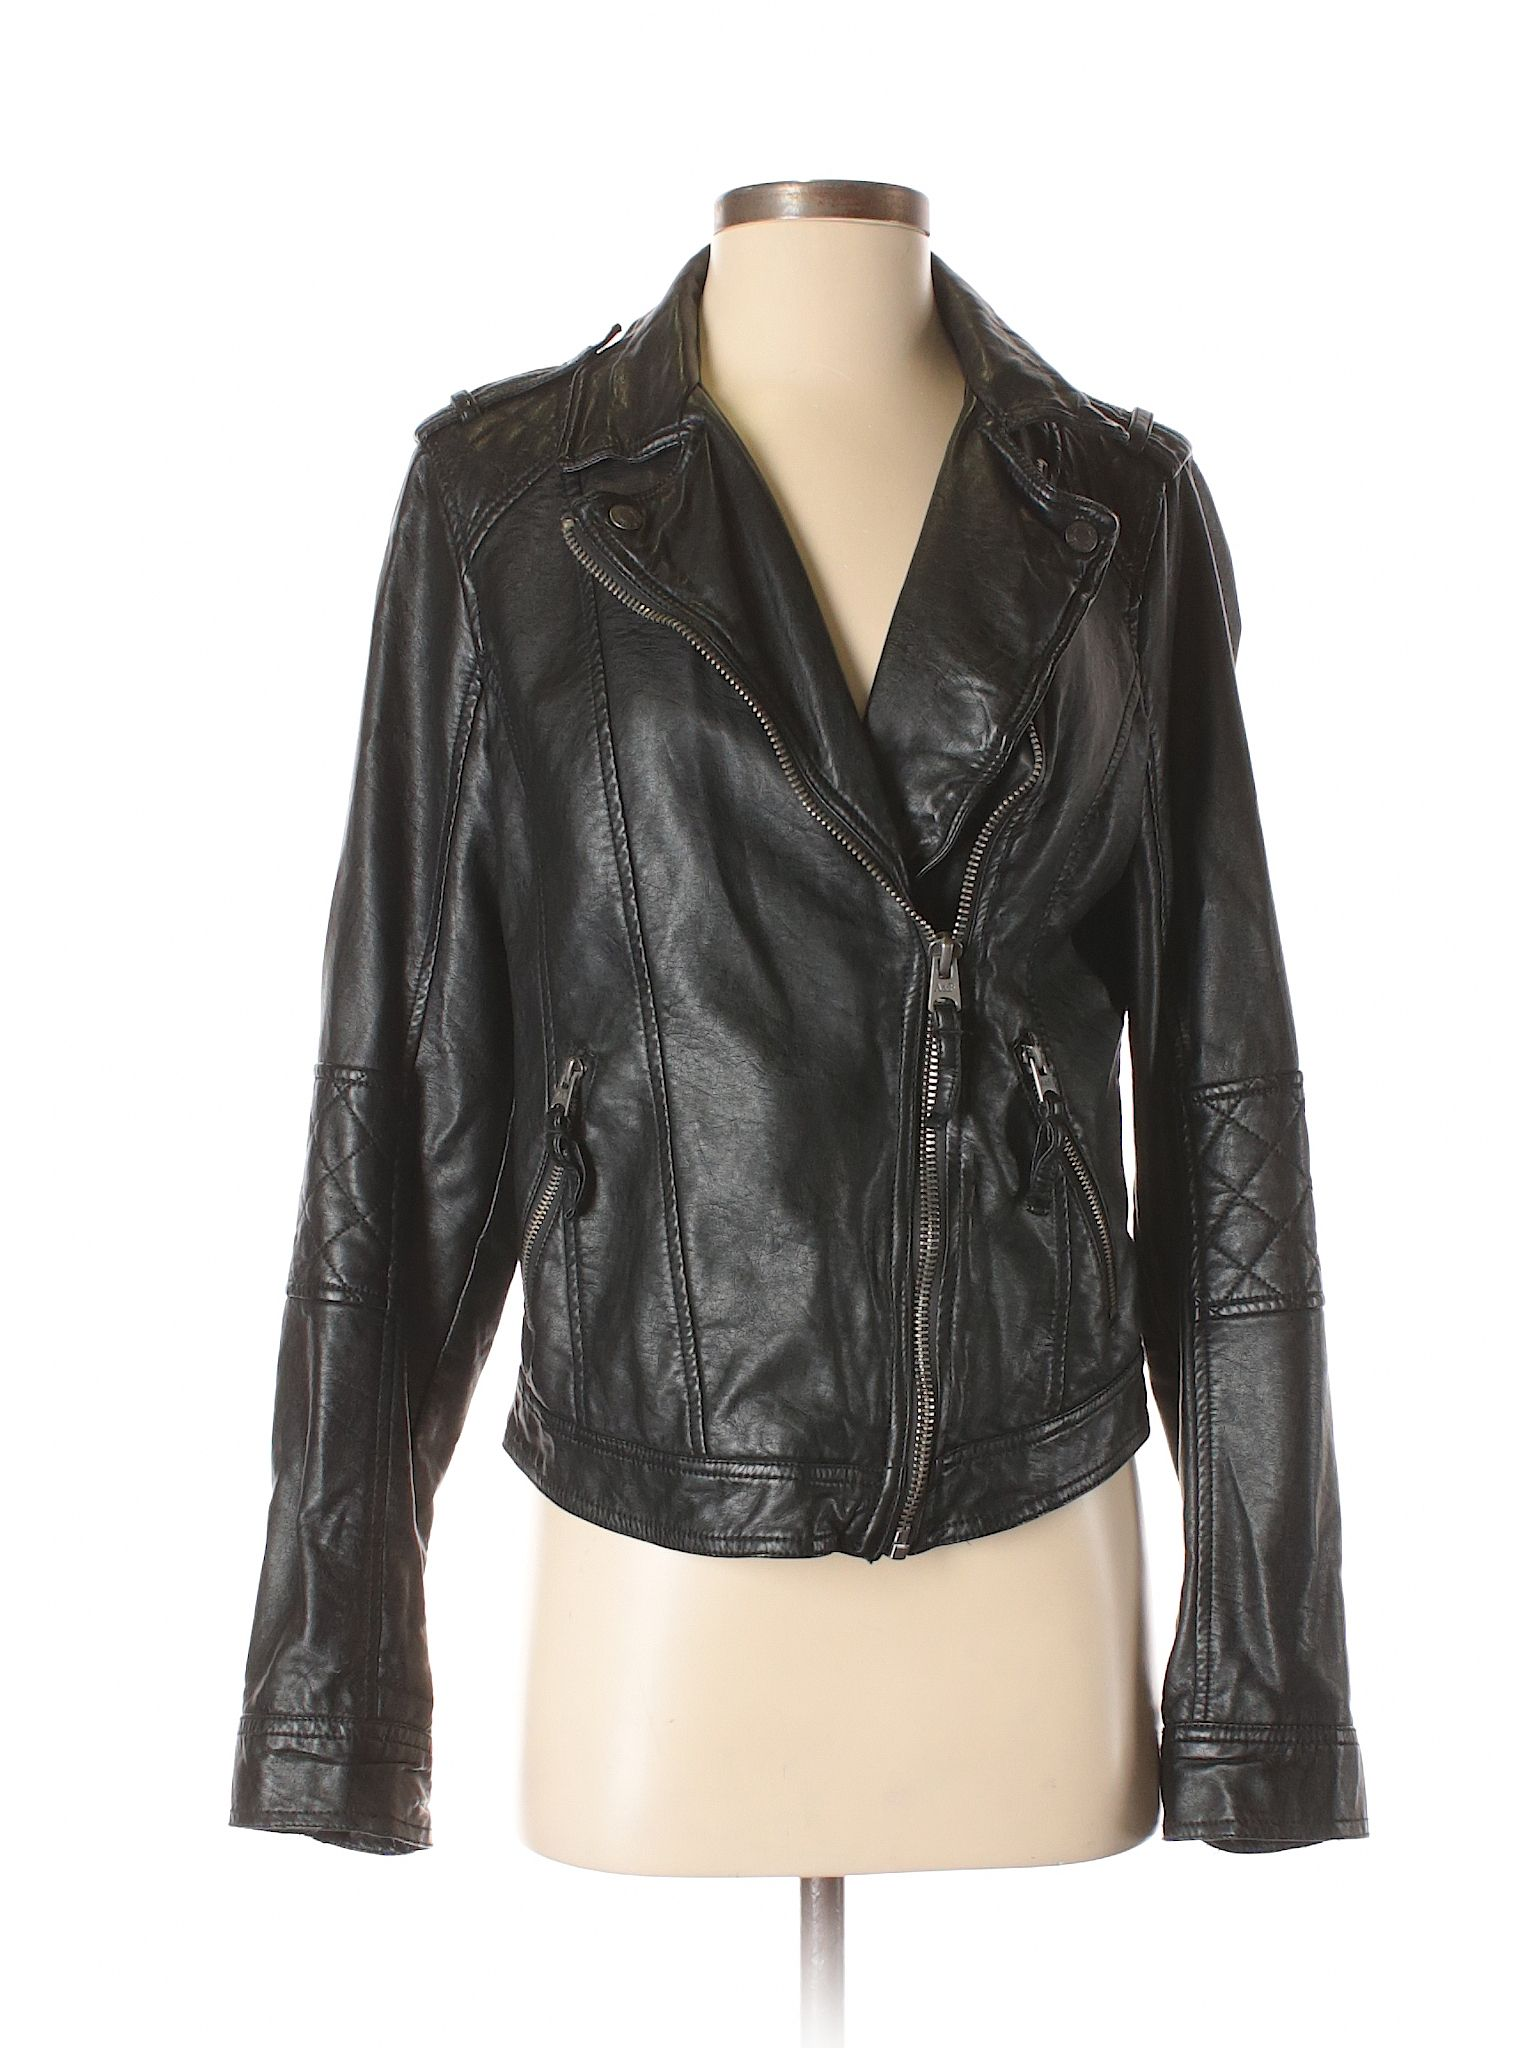 Faux Leather Jacket Leather Jacket Black Faux Leather Jacket Faux Leather Jackets